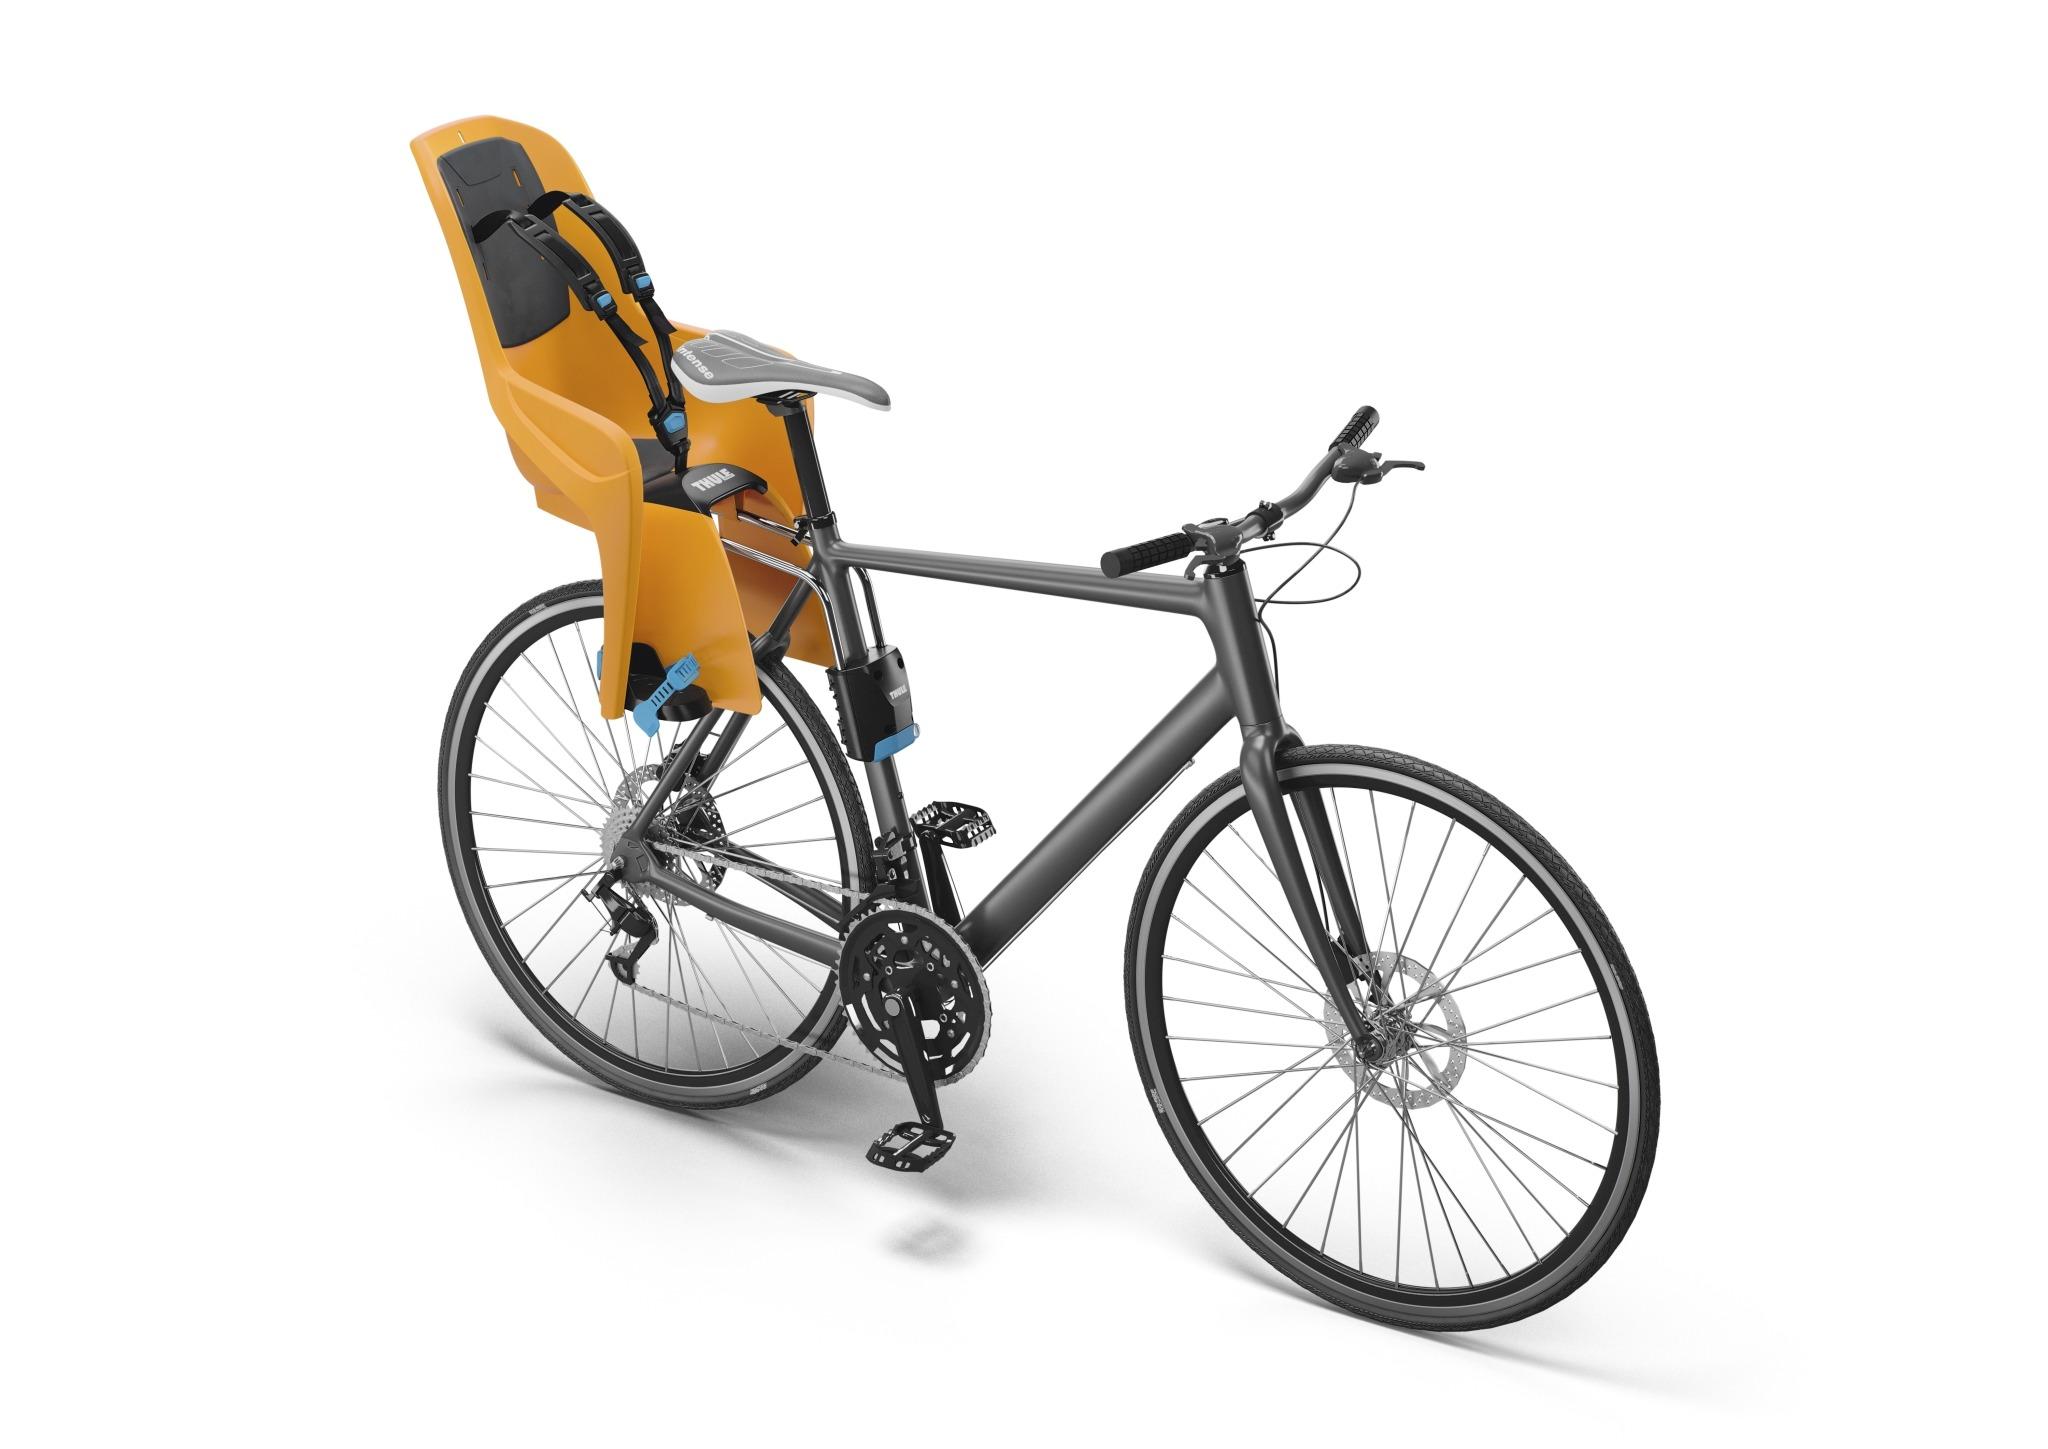 Fotelik rowerowy - THULE RideAlong Lite - pomarańczowy